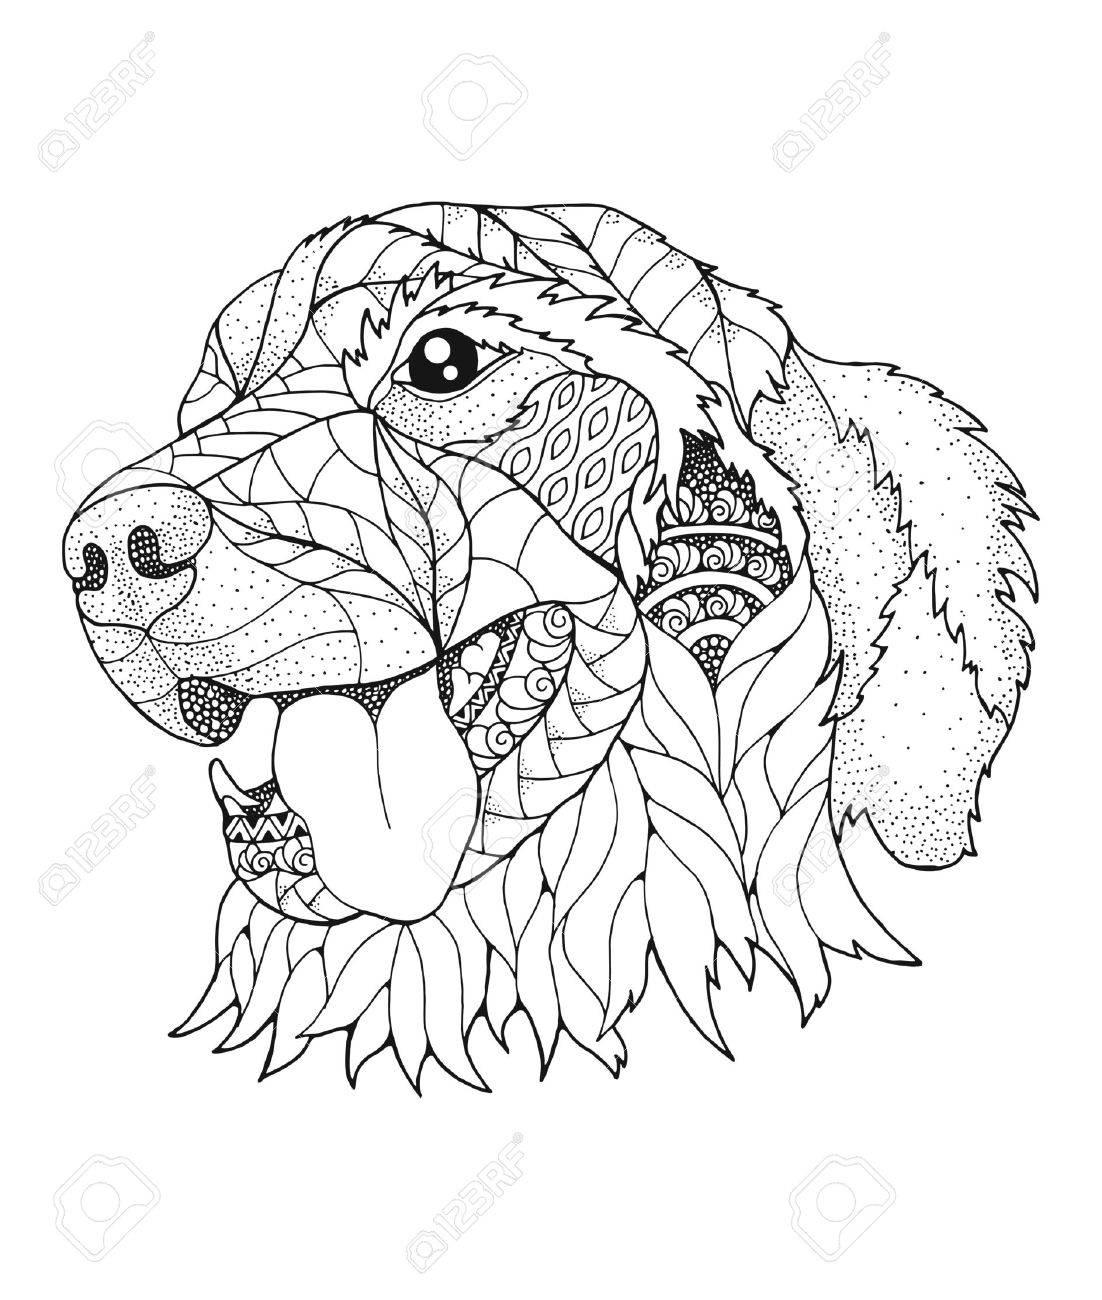 Golden retriever dog in stipple style. - 85878760